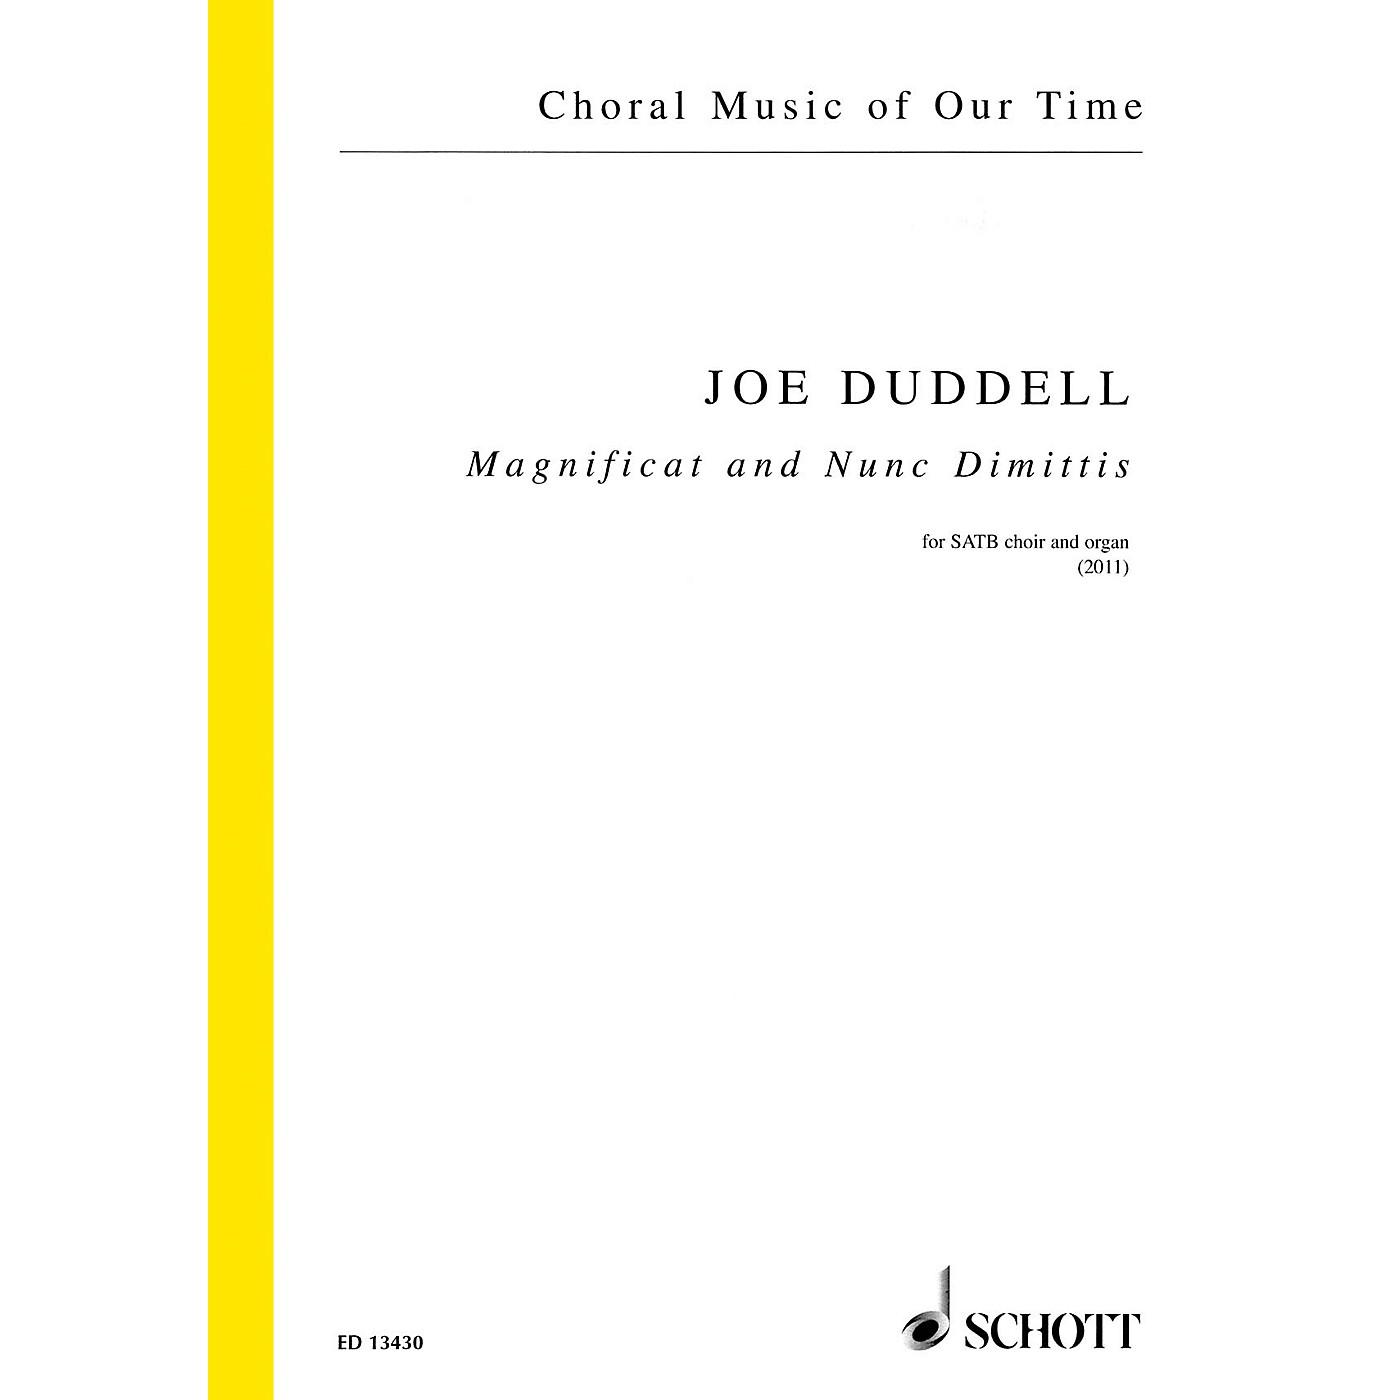 Schott Magnificat and Nunc Dimittis (SATB Choir and Organ) SATB, Organ Composed by Joe Duddell thumbnail